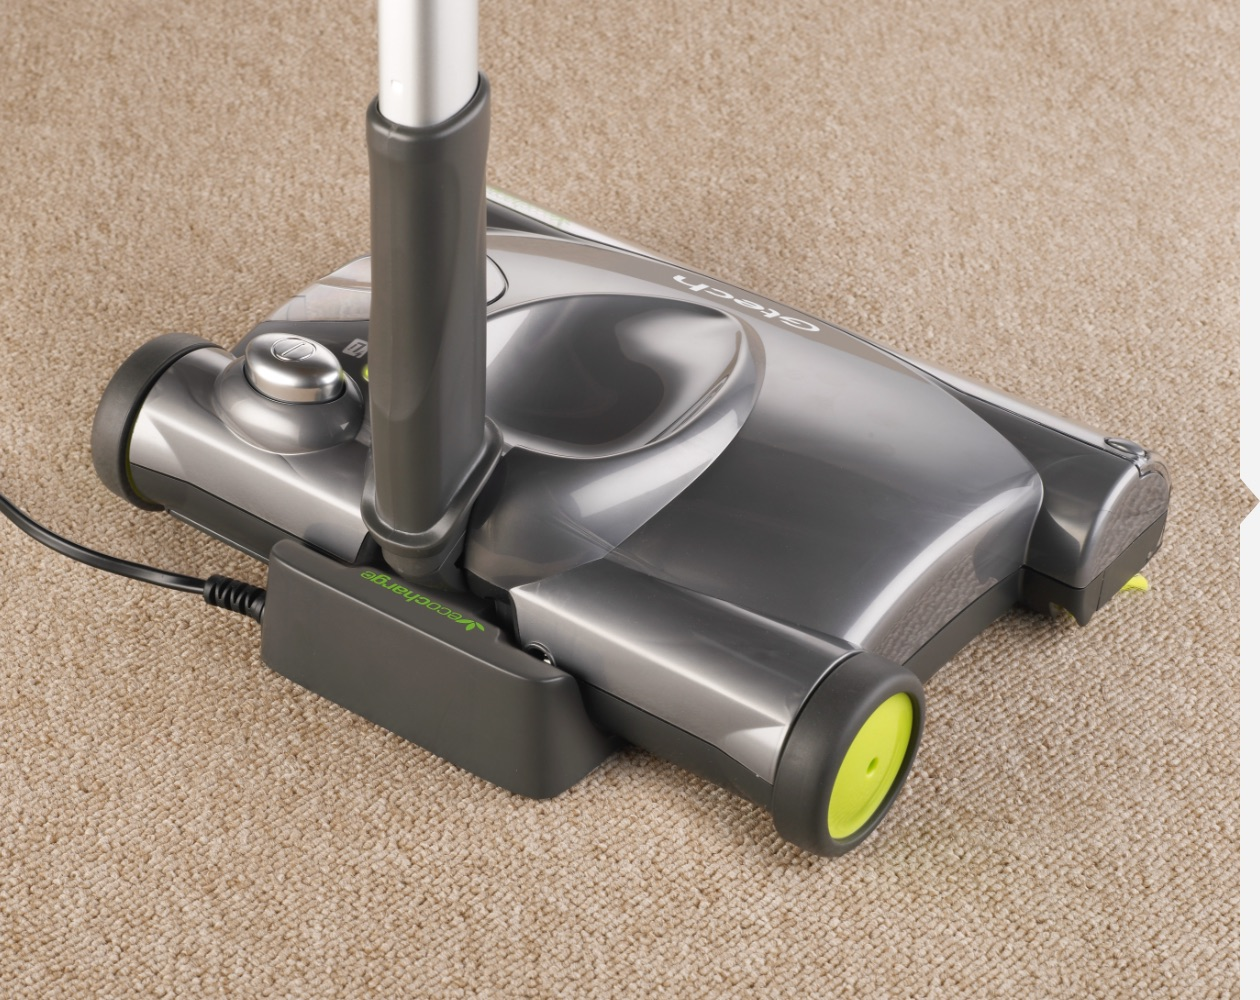 SW22 lithium cordless carpet sweeper